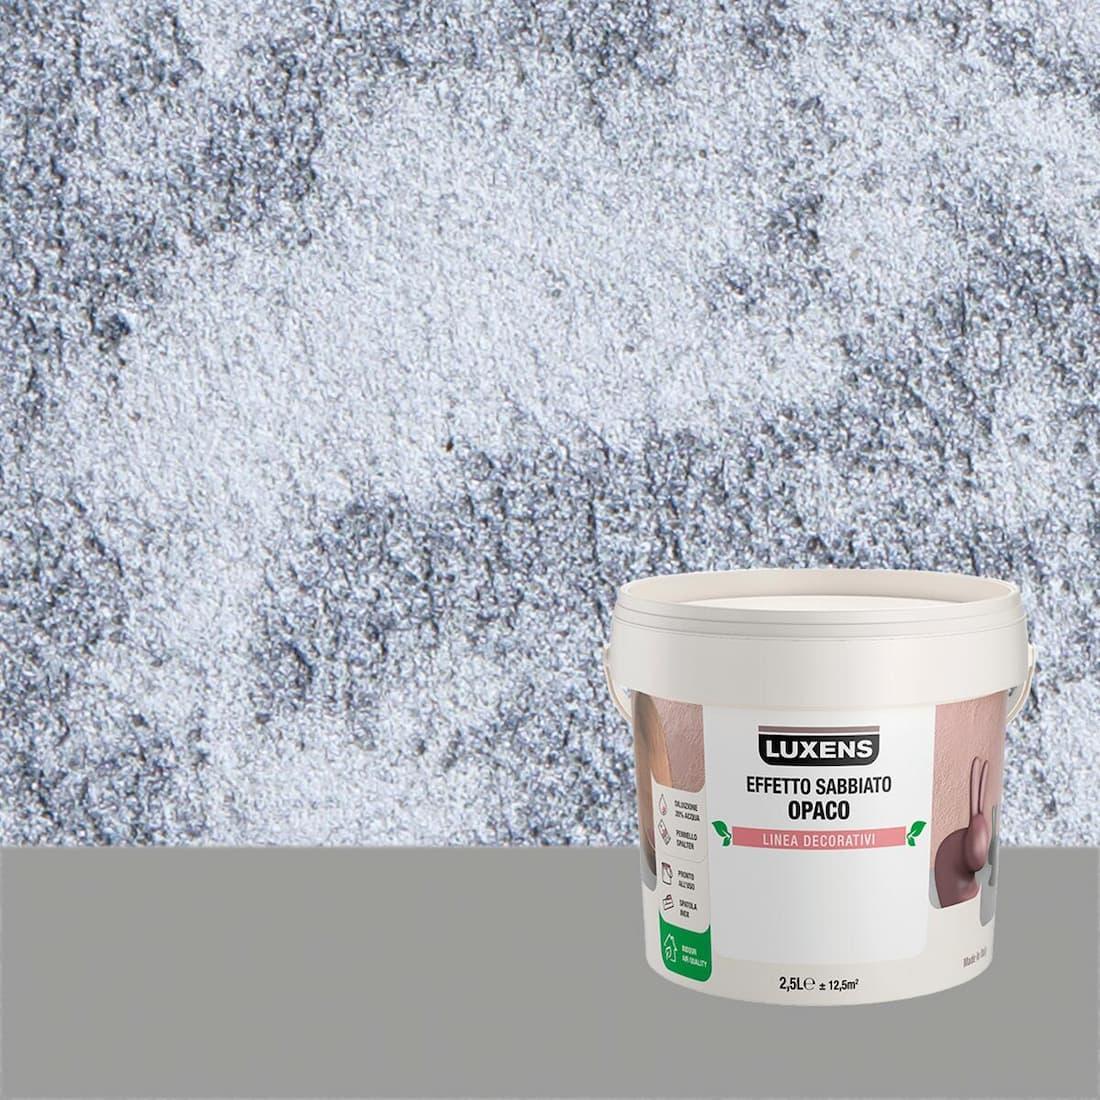 Pittura decorativa effetto sabbia, Leroy merlin, linea Luxens